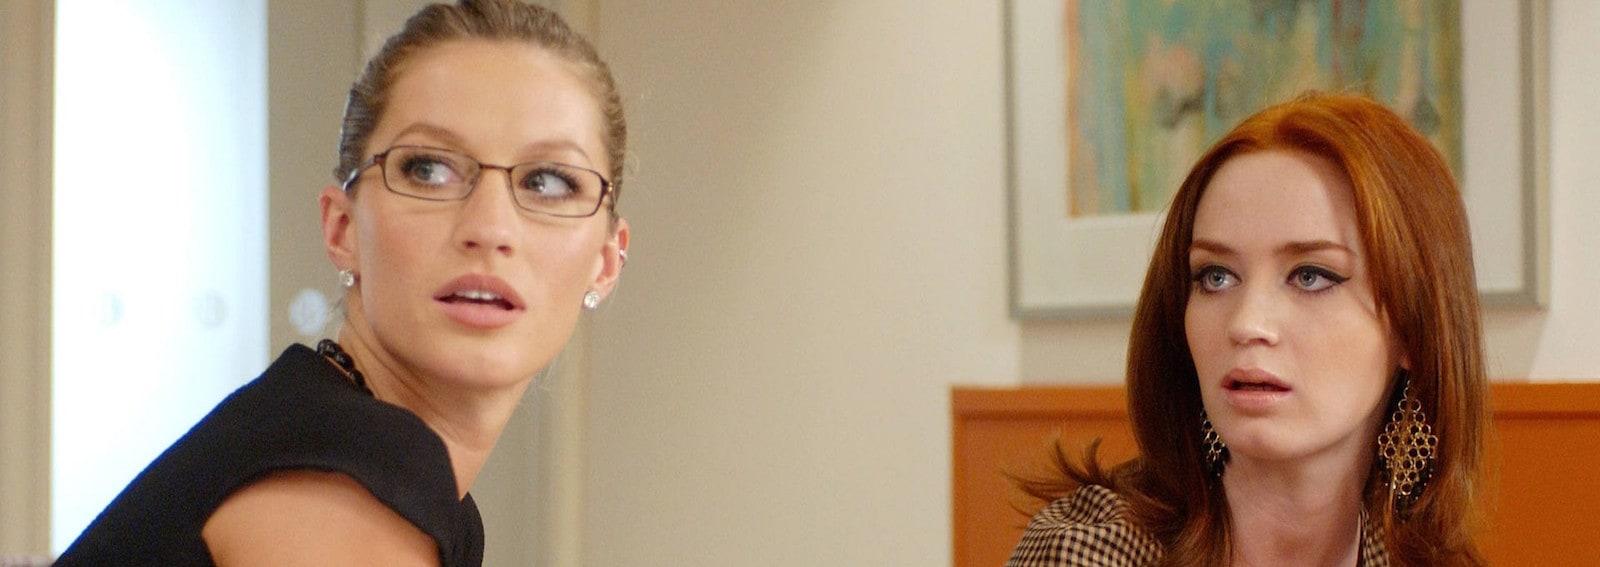 Emily Blunt orecchini oro